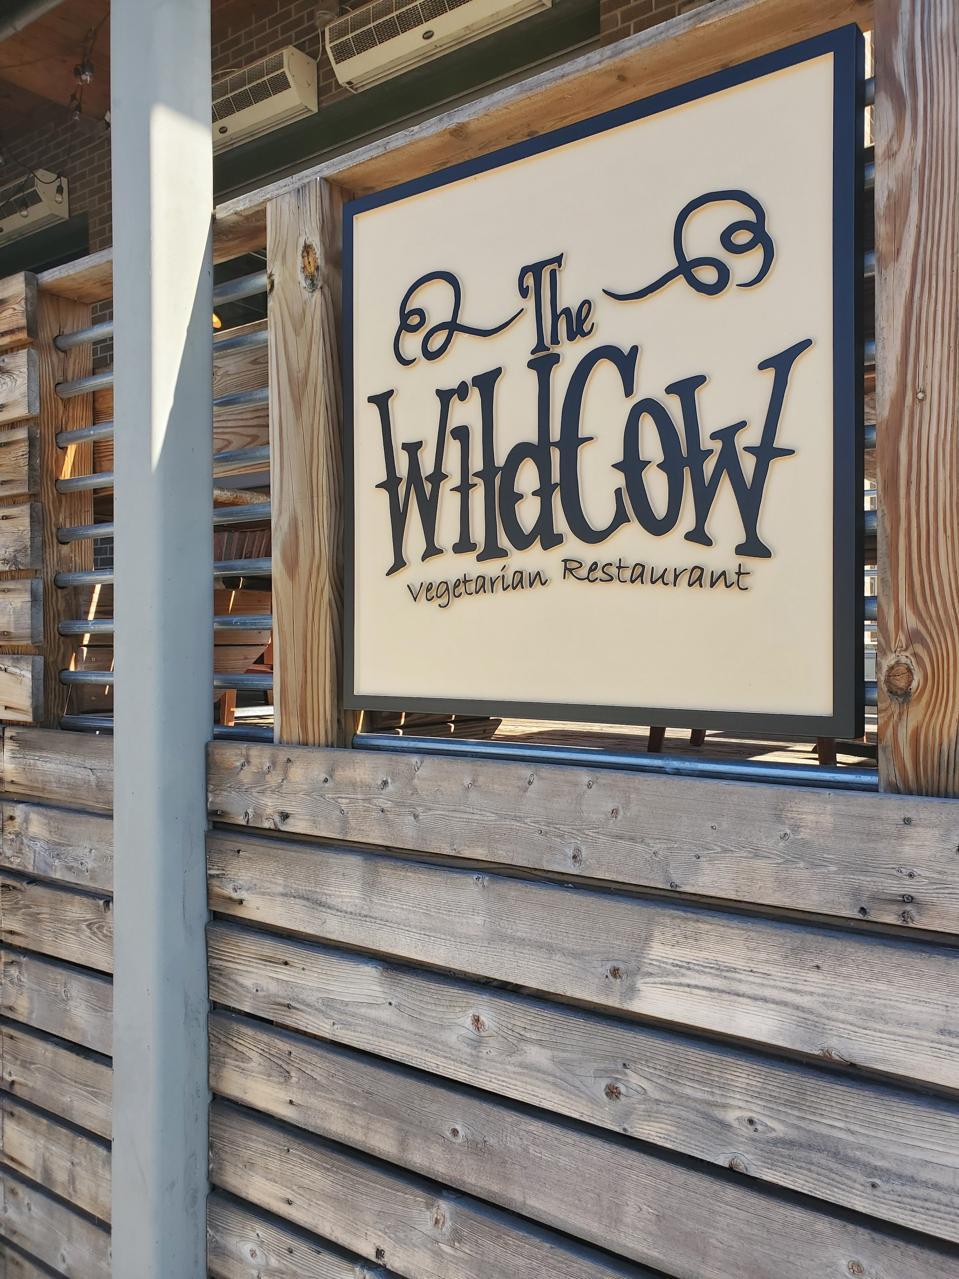 The Wild Cow vegan restaurant